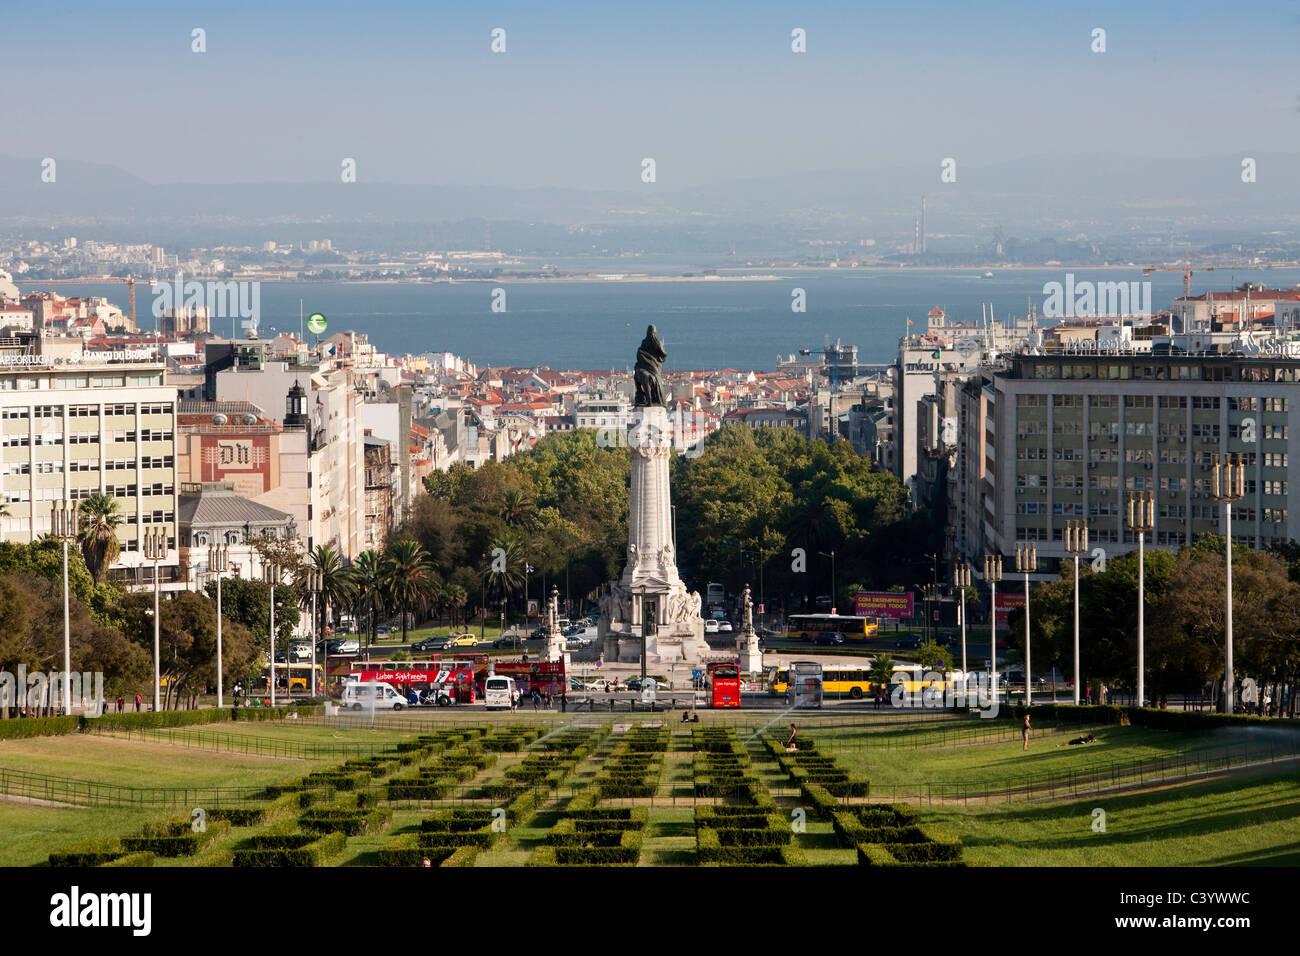 Portugal, Europe, Lisbon, Eduardo, park, park, column, overview, sea, town, city, - Stock Image